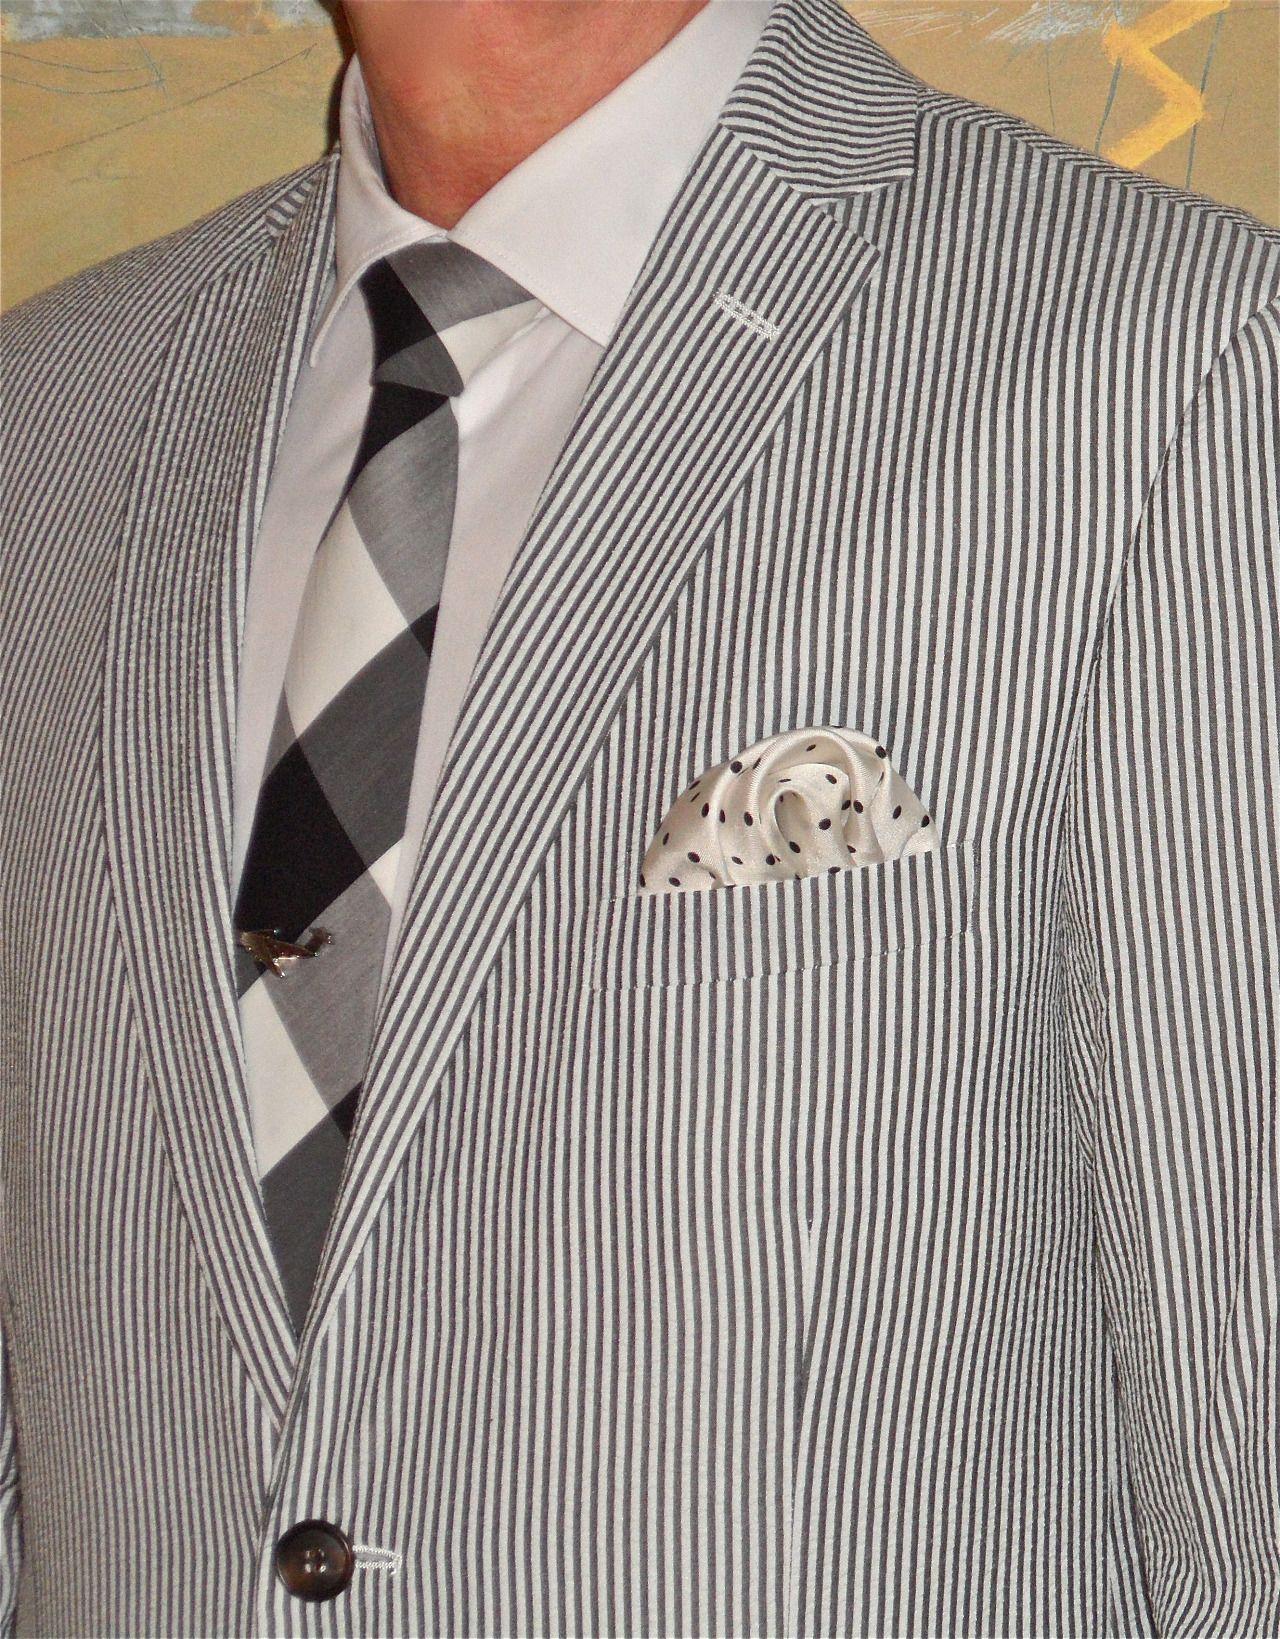 Frank & Oak blazer, Mastai Ferretti shirt, Penguin tie… #Gotstyle #Shopgotstyle #FrankAndOak #MastaiFerretti #Penguin #menstyle #menswear #menscouture #mensfashion #instafashion #fashion #hautecouture #sartorial #sprezzatura #style #dapper #dapperstyle #pocketsquare